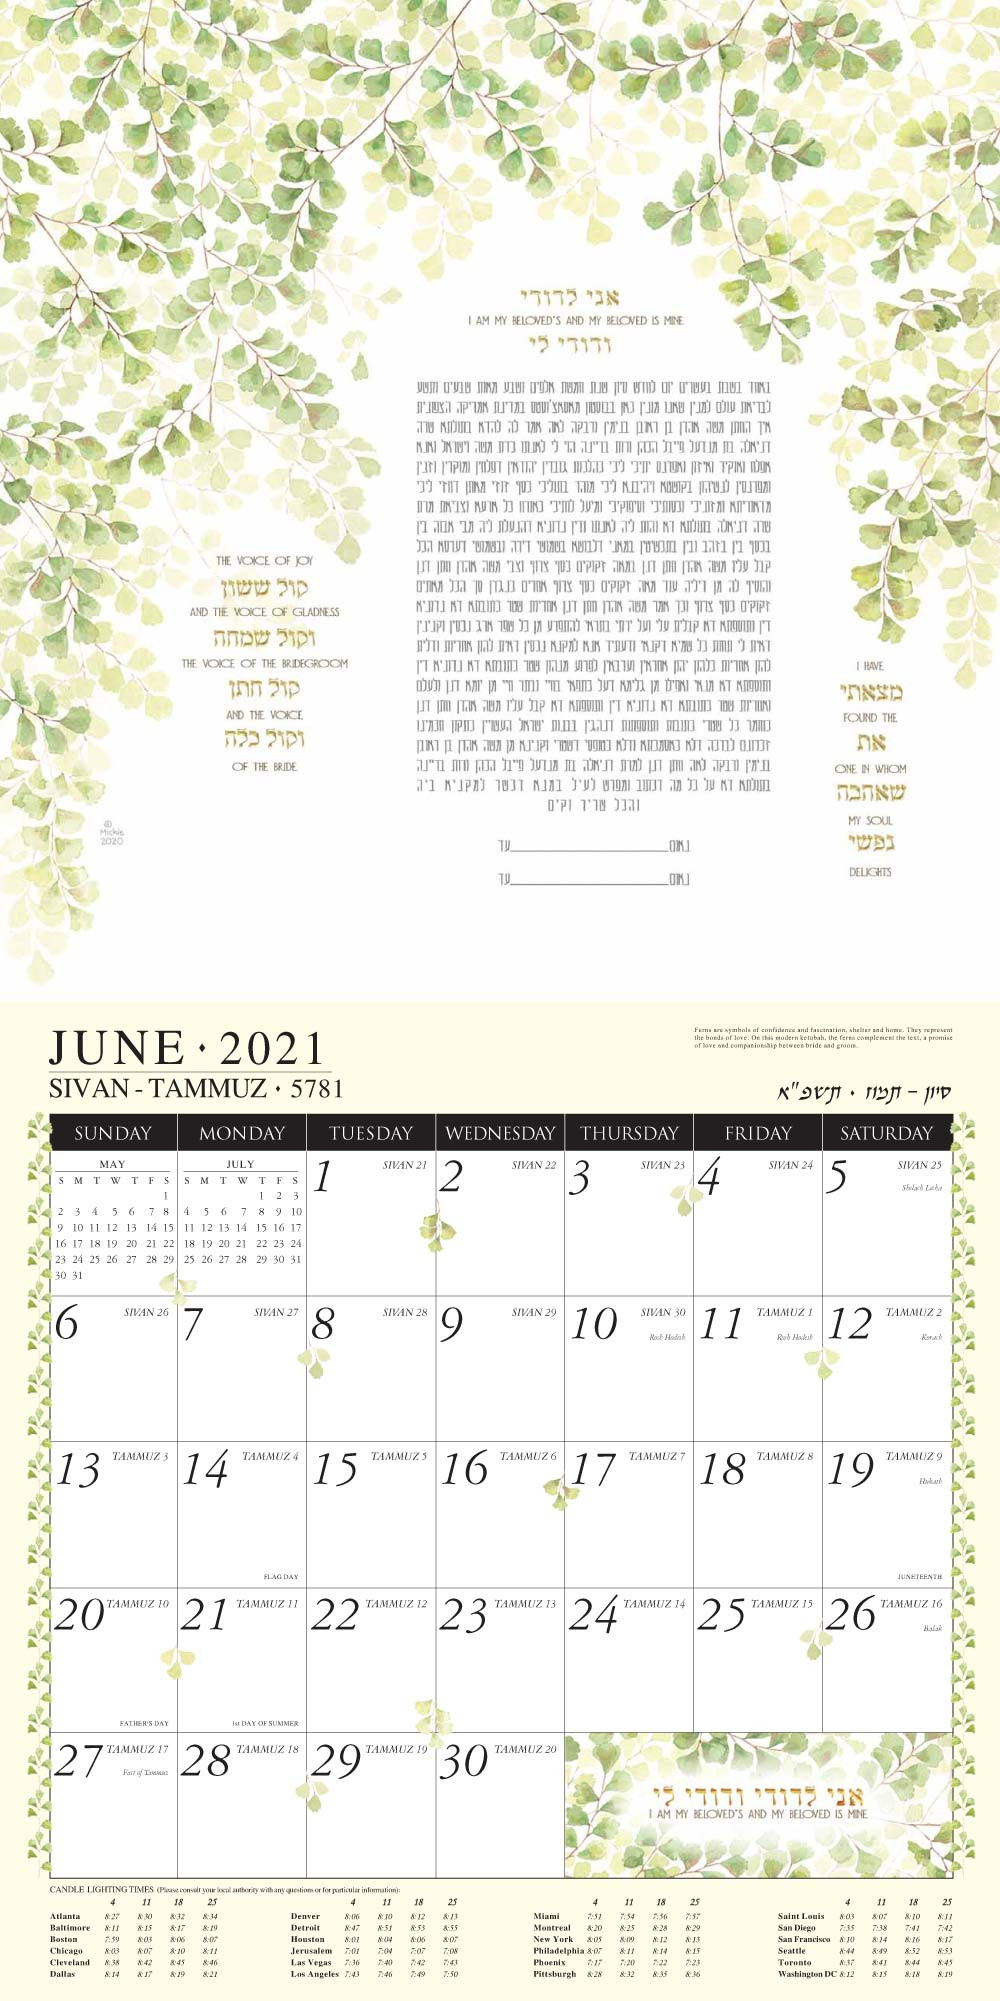 Jewish Art Calendar 2021 By Mickie - Caspi Cards & Art-Pic Of Hebrew Calendar June 2021